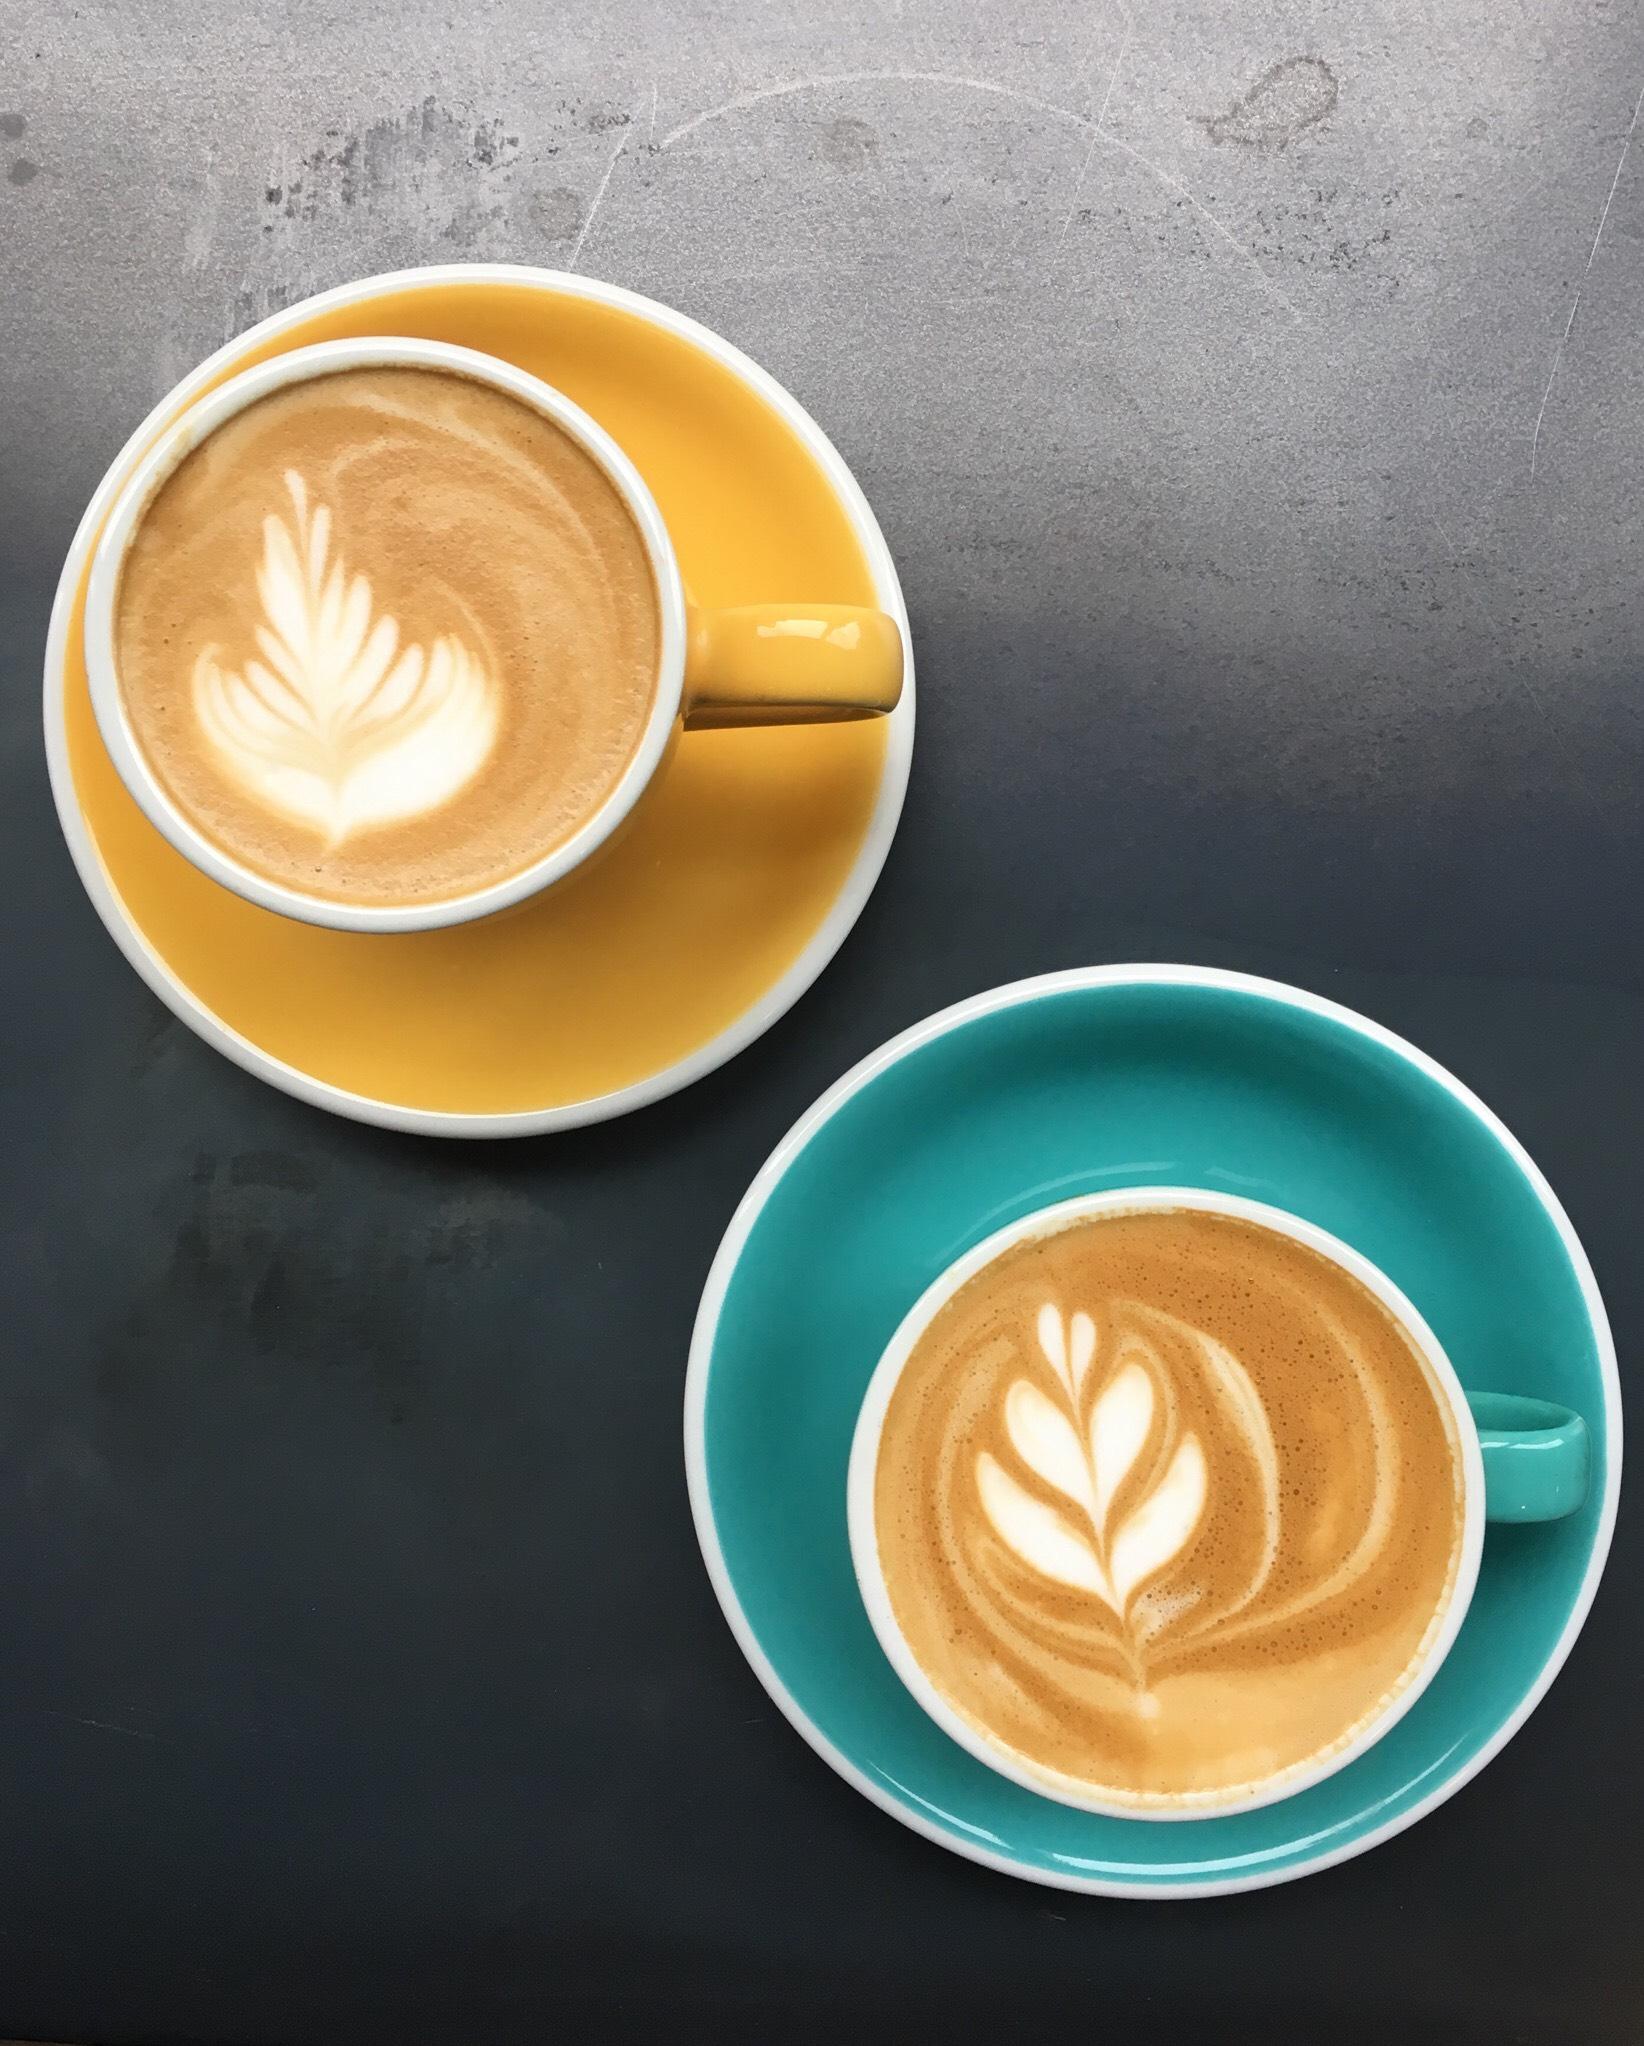 Body-Machine-Performance-Studio-London-Cafe-Coffee.jpeg